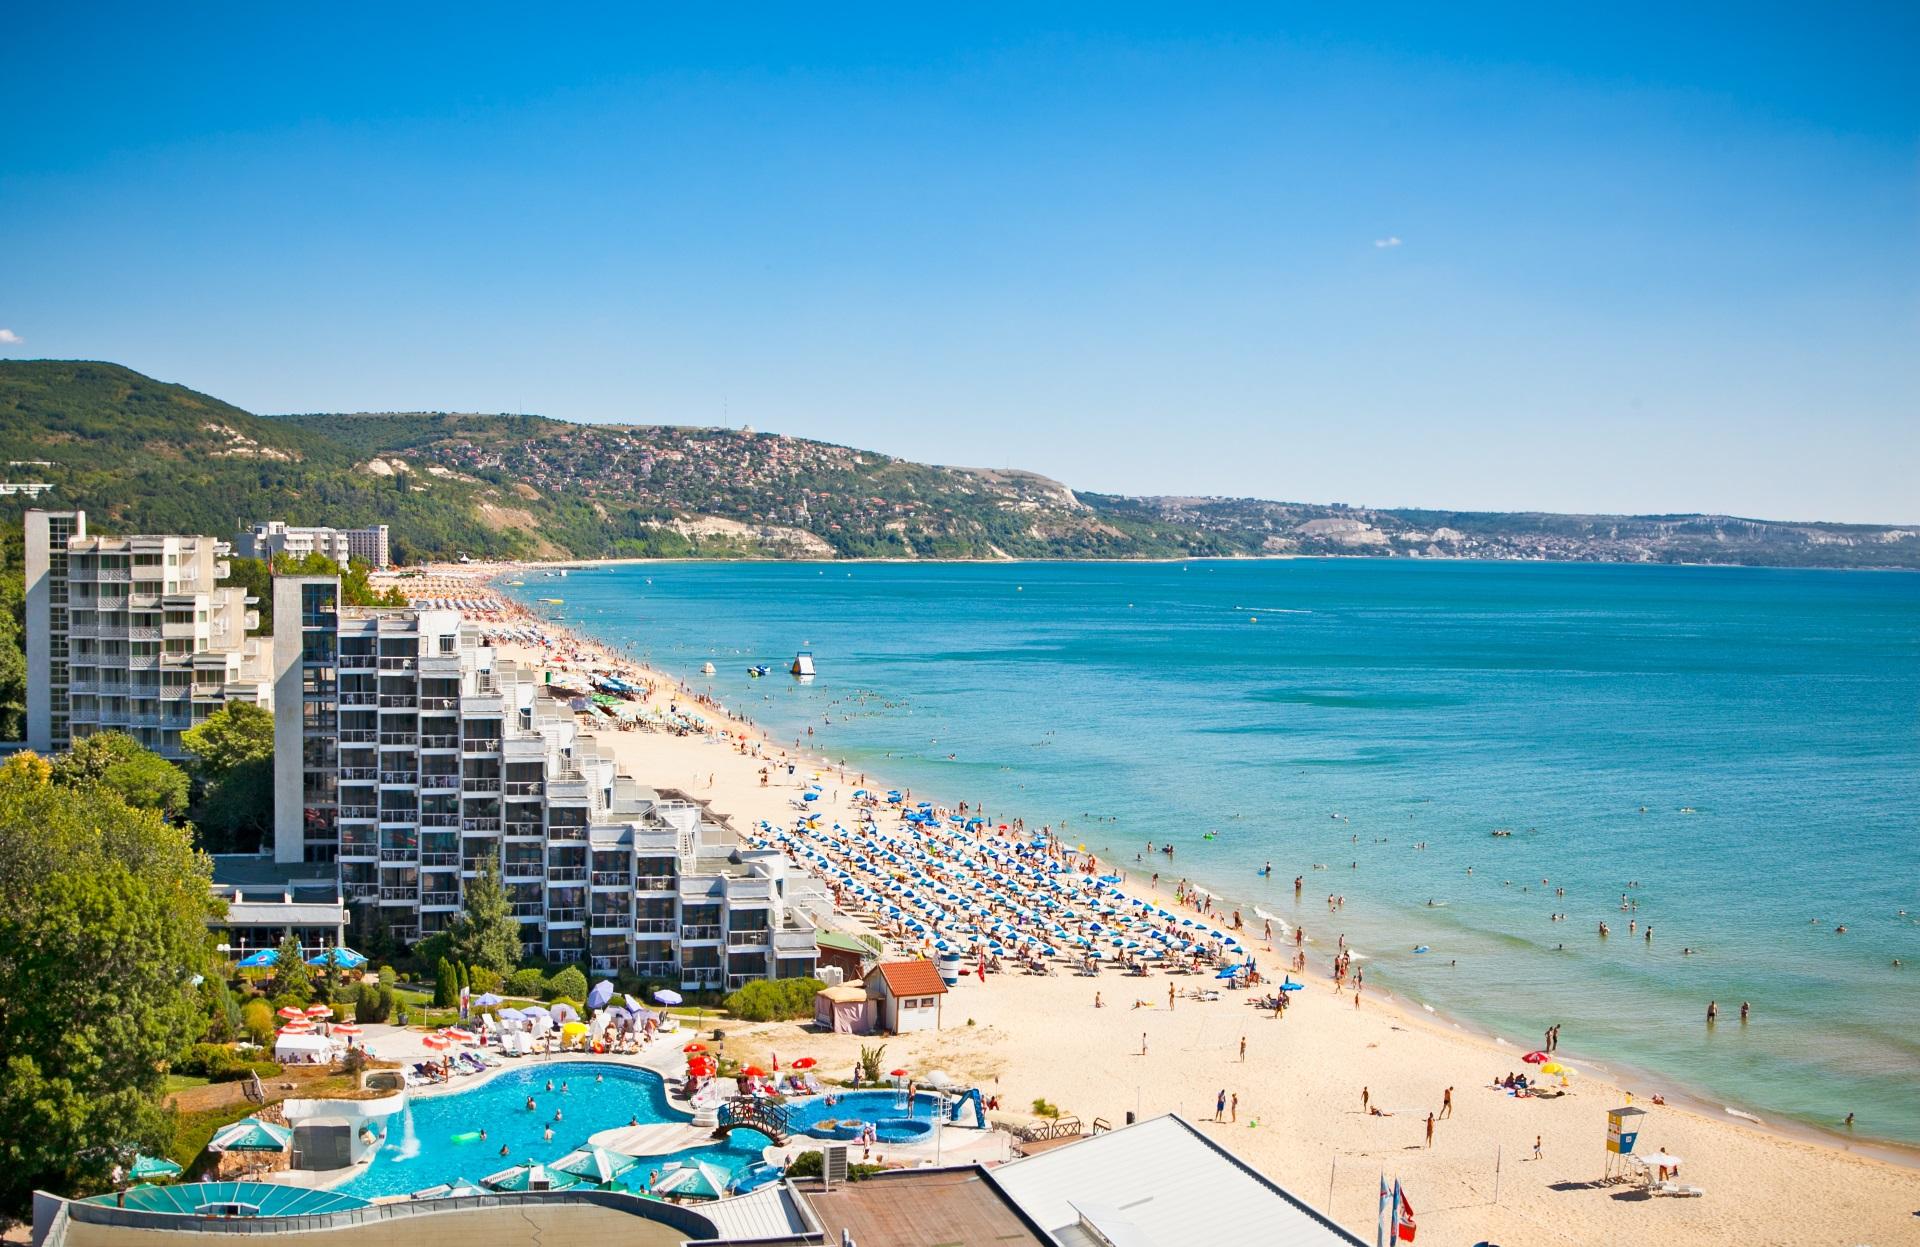 Bulgarien Goldstrand Partyurlaub